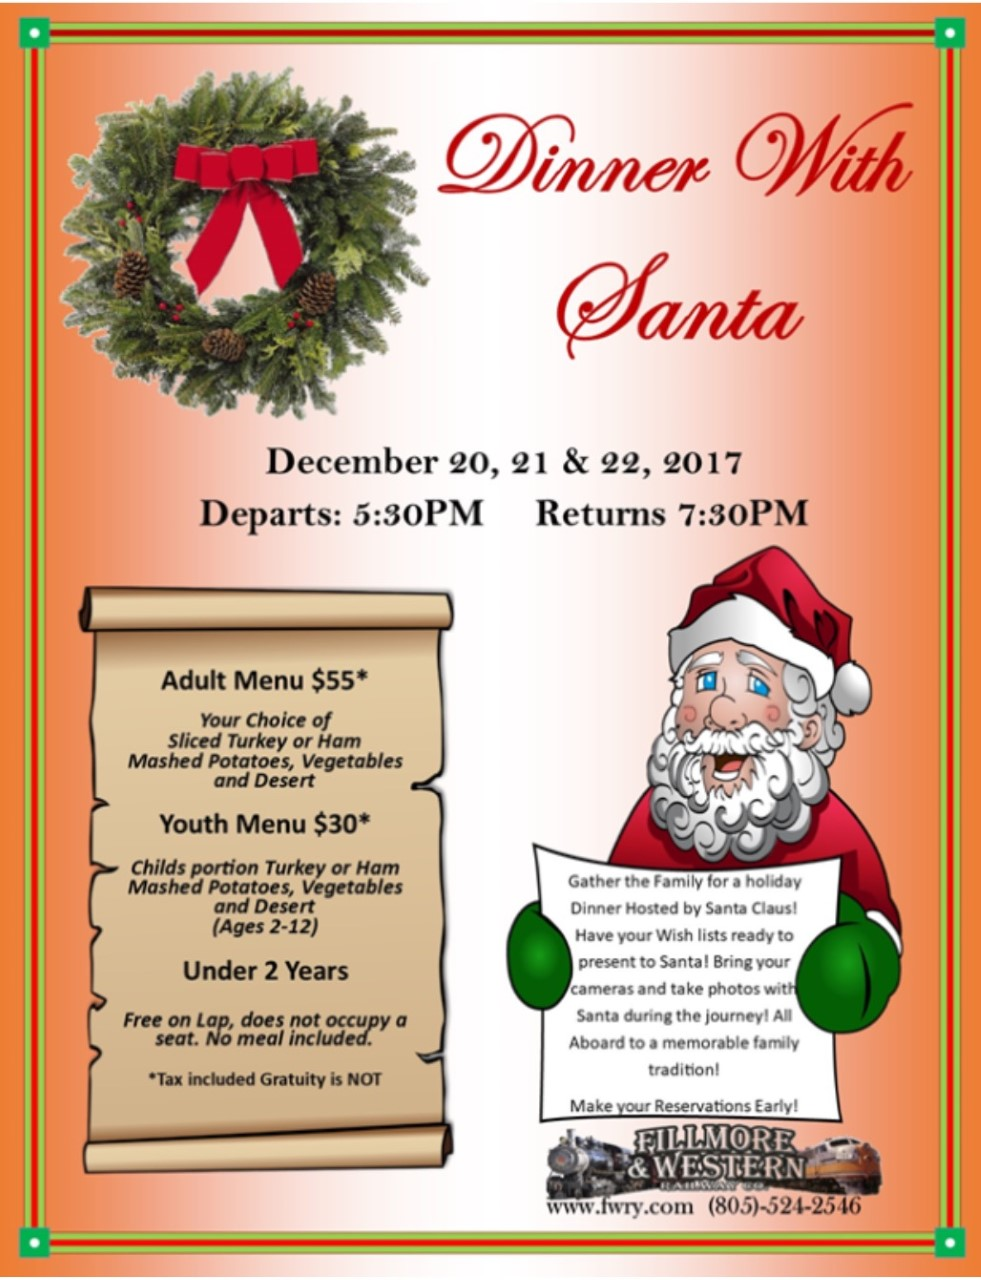 Dinner with Santa Dec 20-22, 2017.jpg